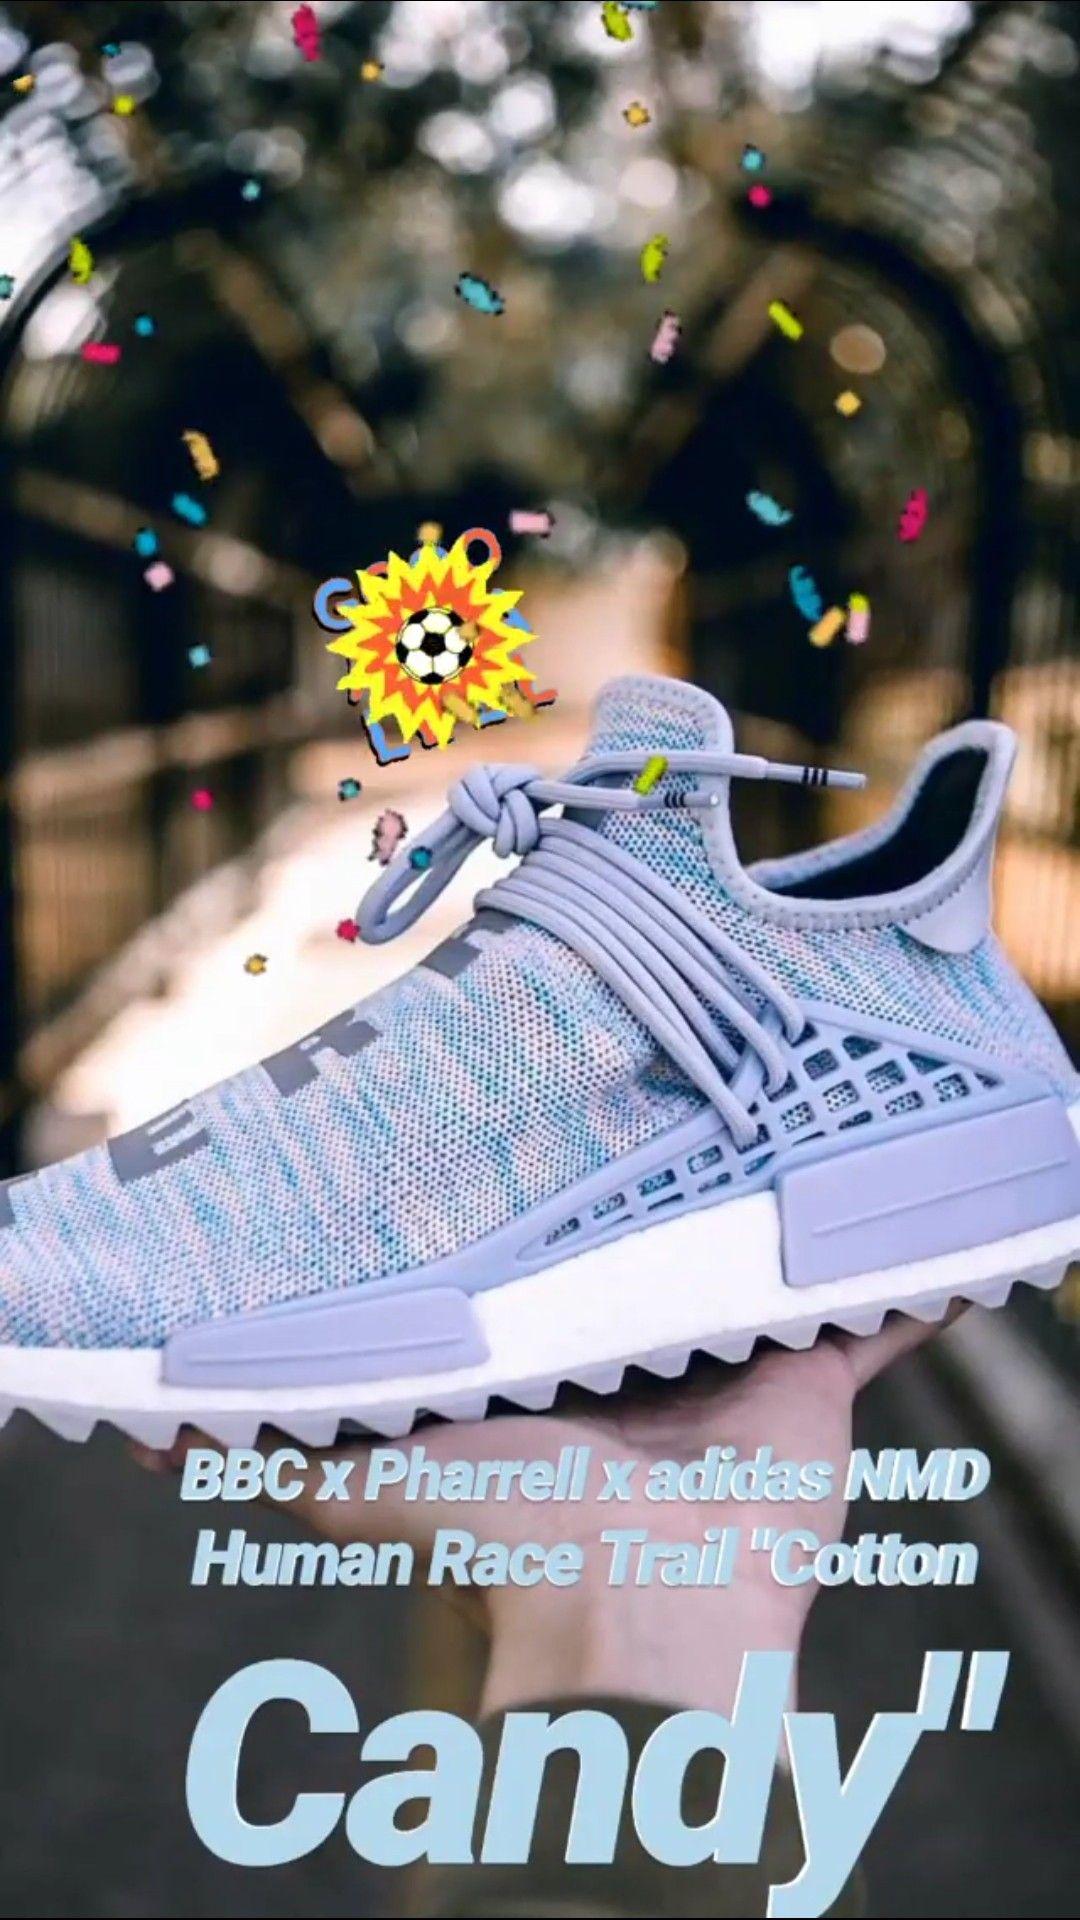 wholesale dealer a87bc ef67d BBC x Pharrell x adidas NMD Human Race Trail